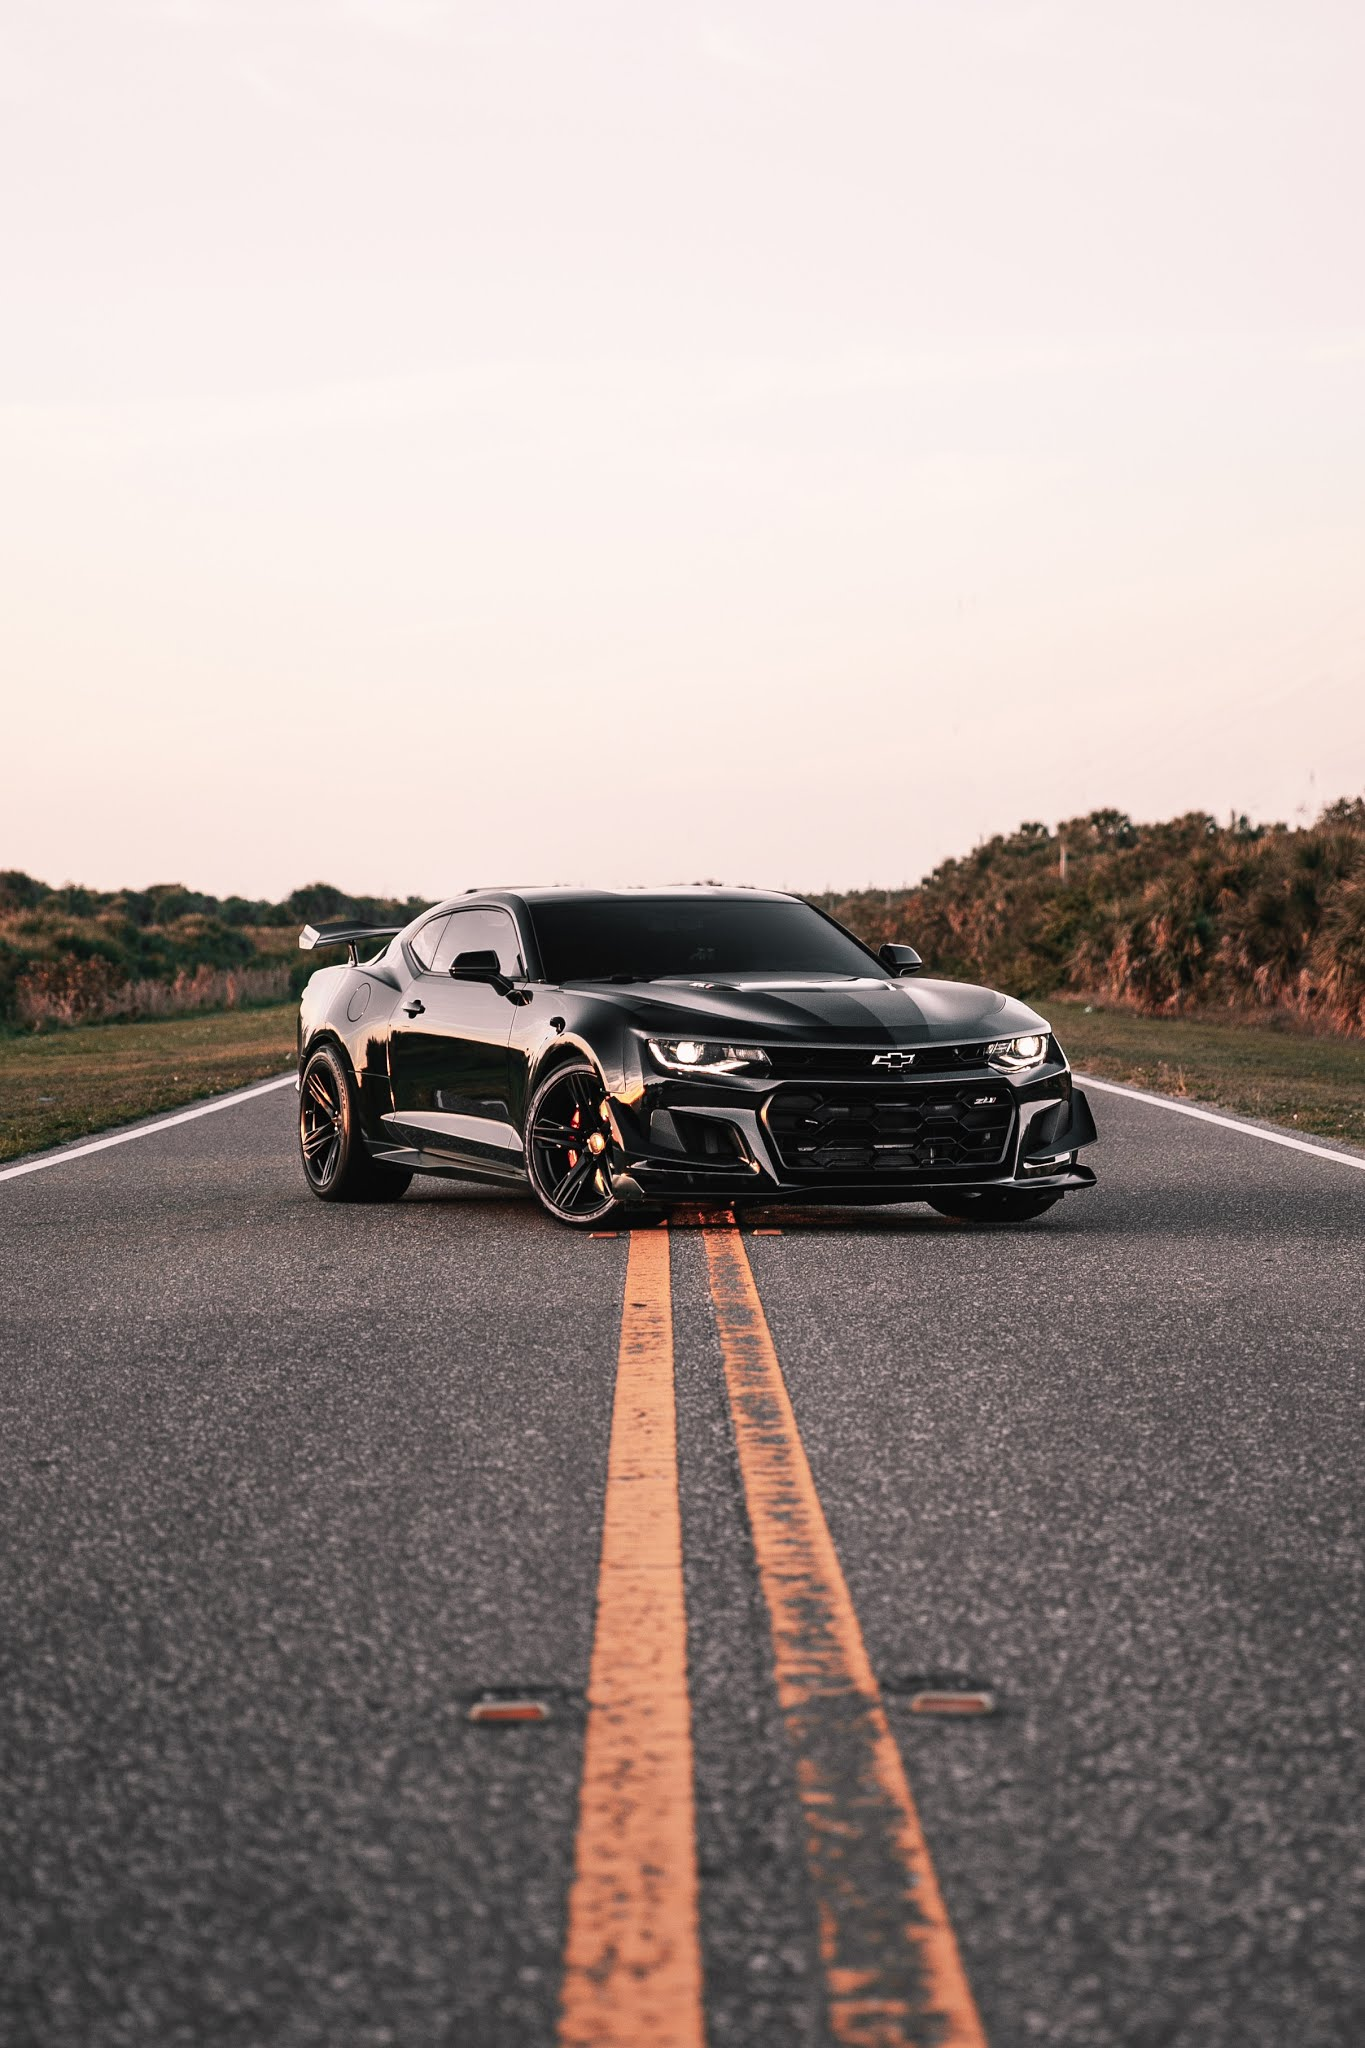 Black car on road - HD Mobile Walls